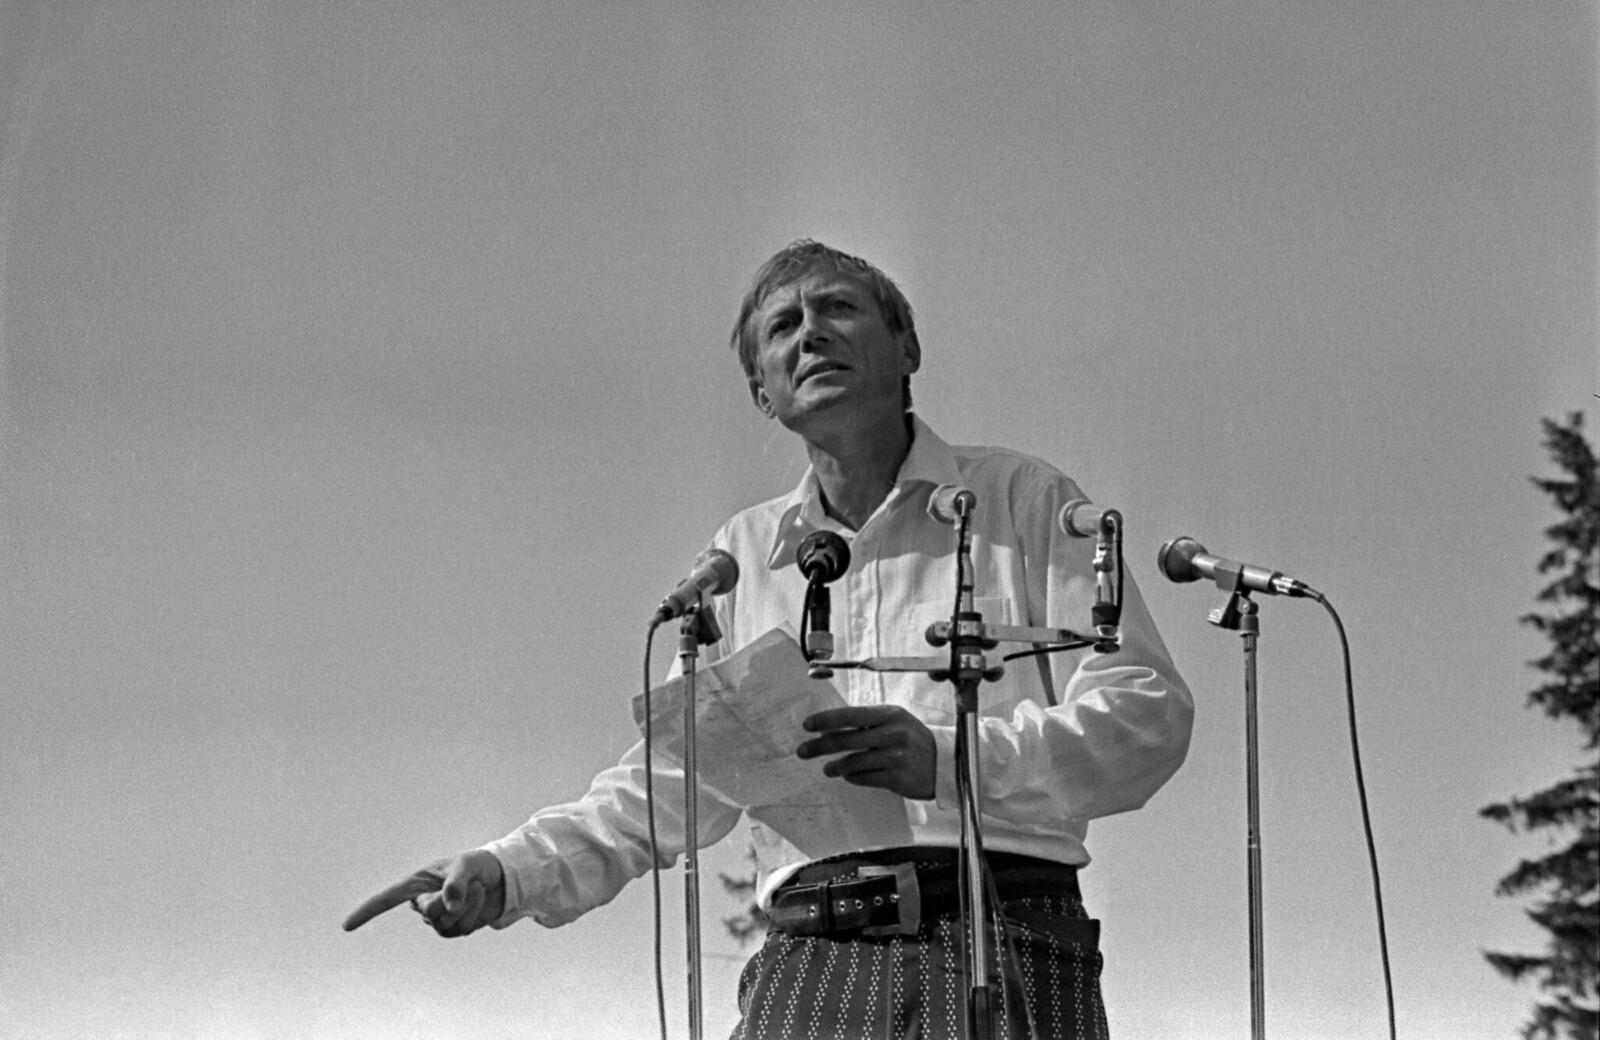 1974. Блоковский праздник в Шахматове, Поэт Евгений Евтушенко (3)